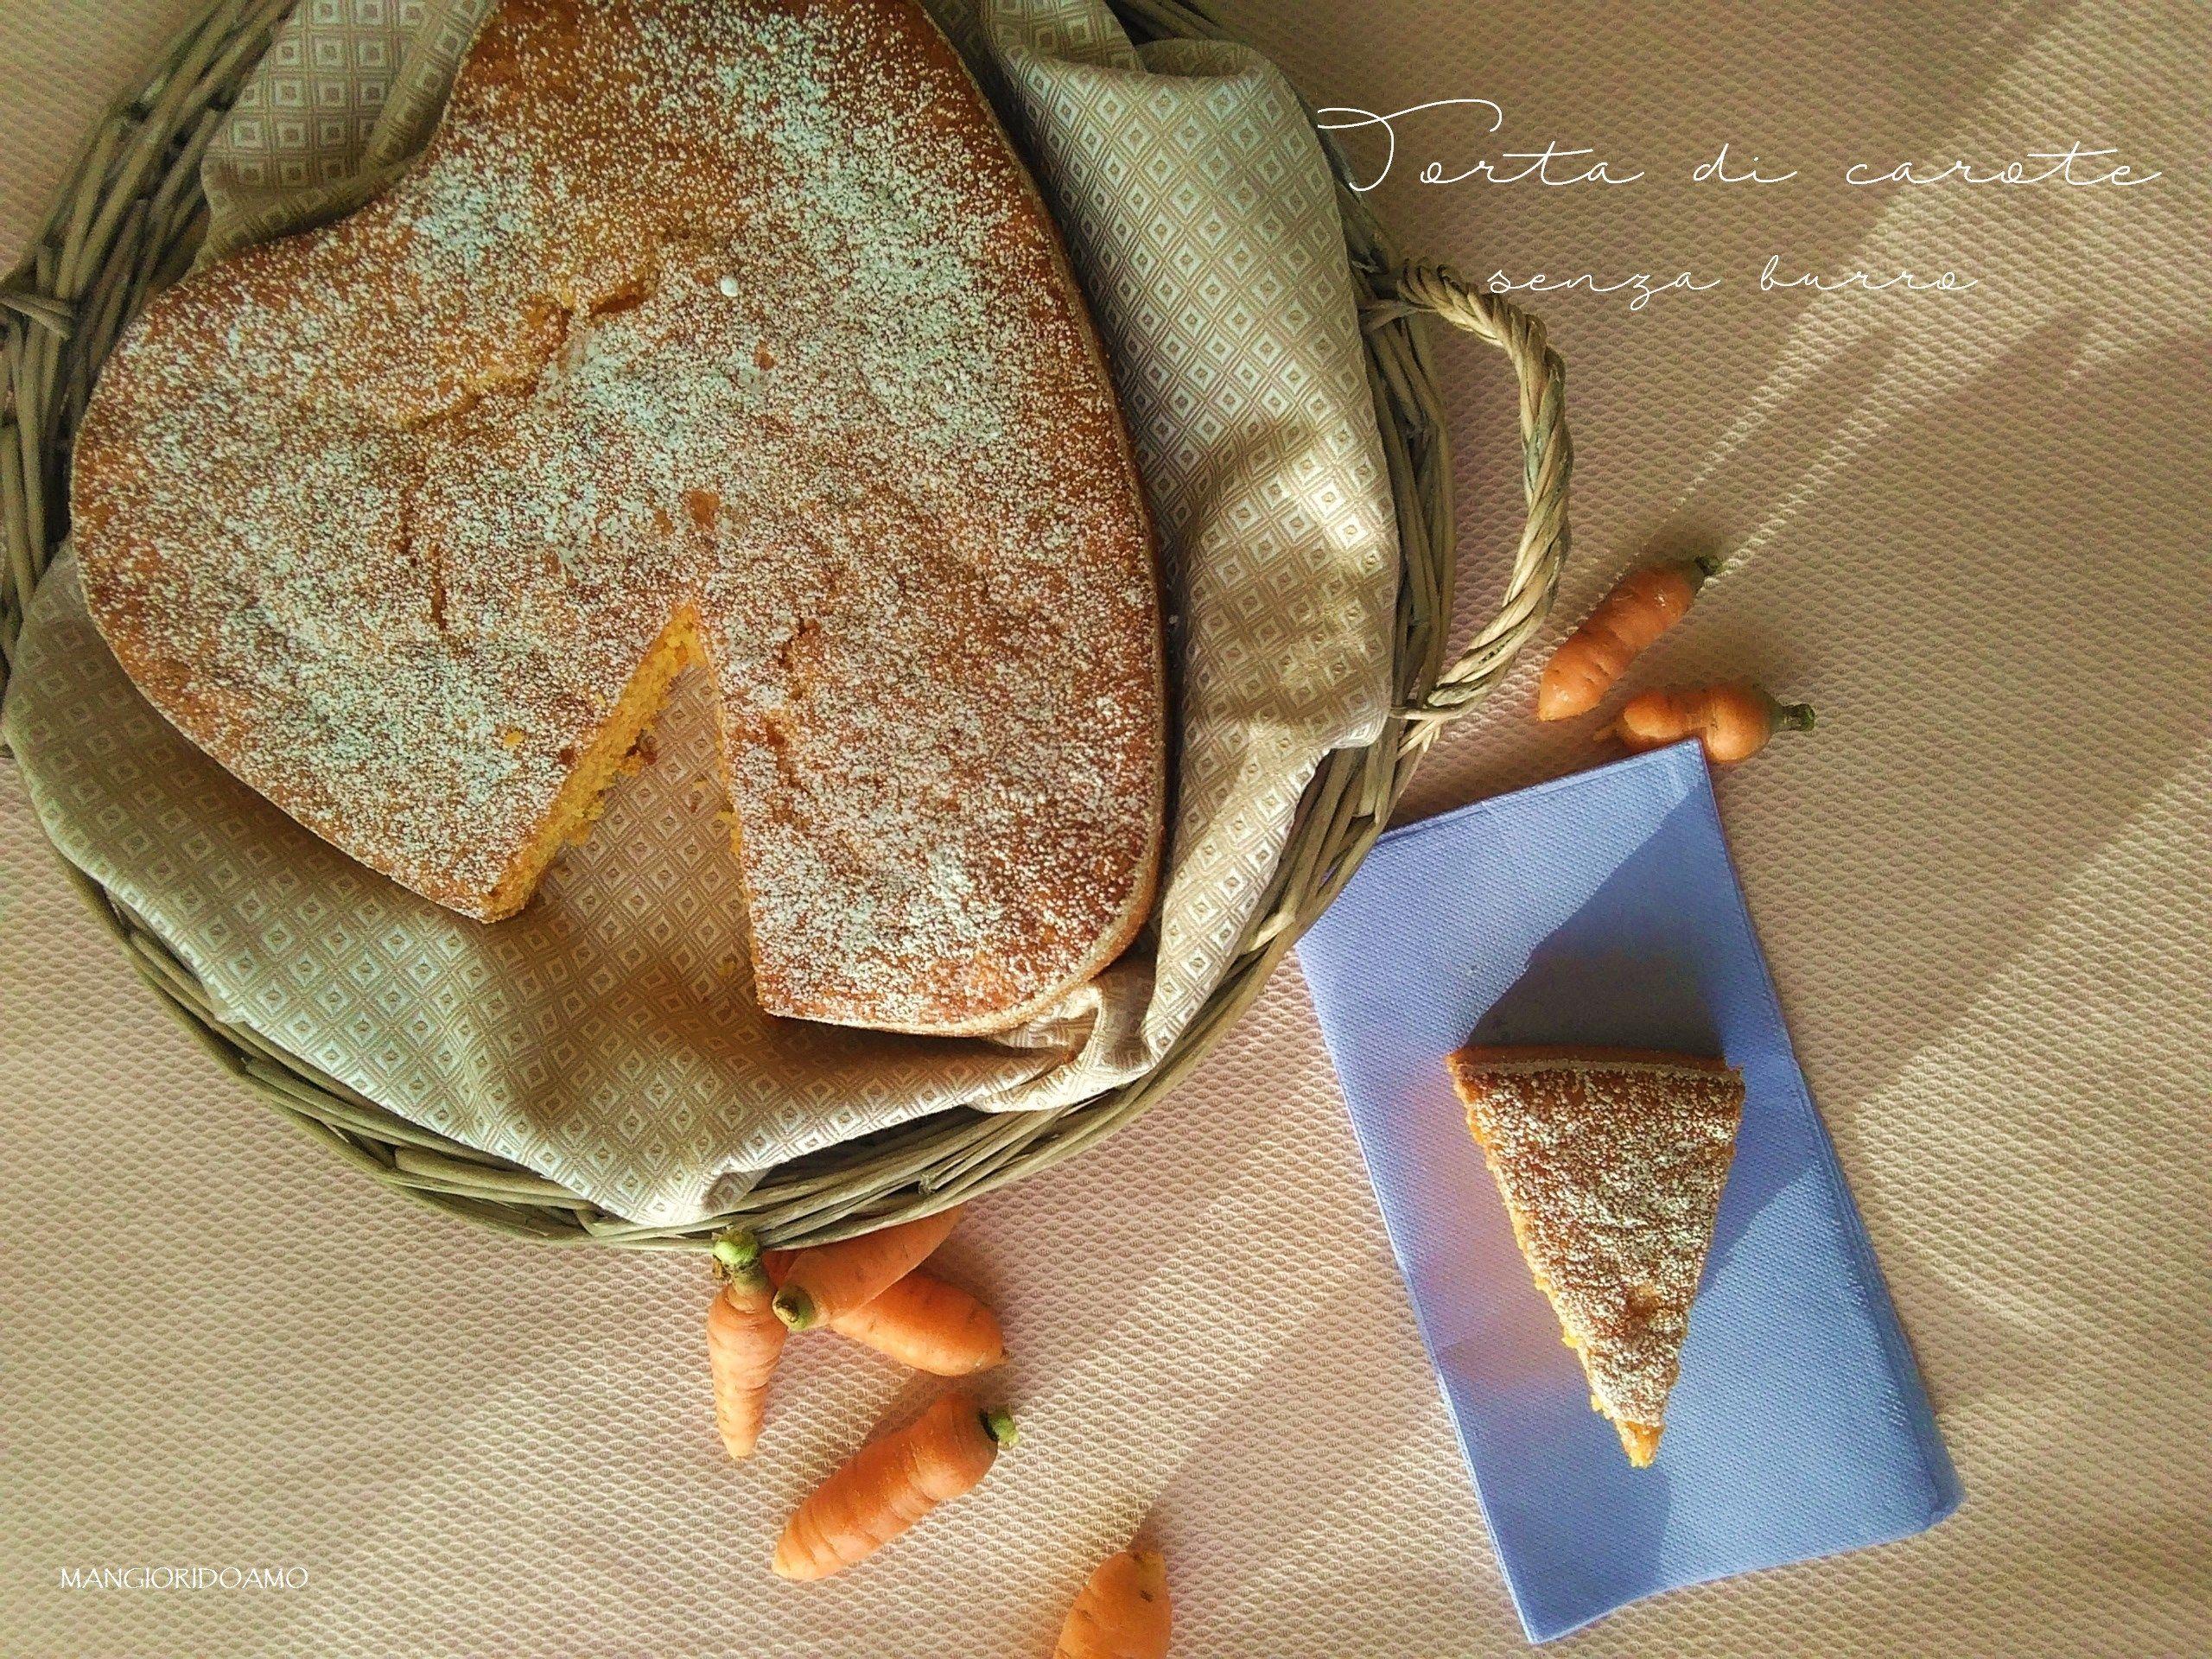 Torta di carote senza burro http://www.mangioridoamo.com/2016/09/19/torta-di-carote-senza-burro/